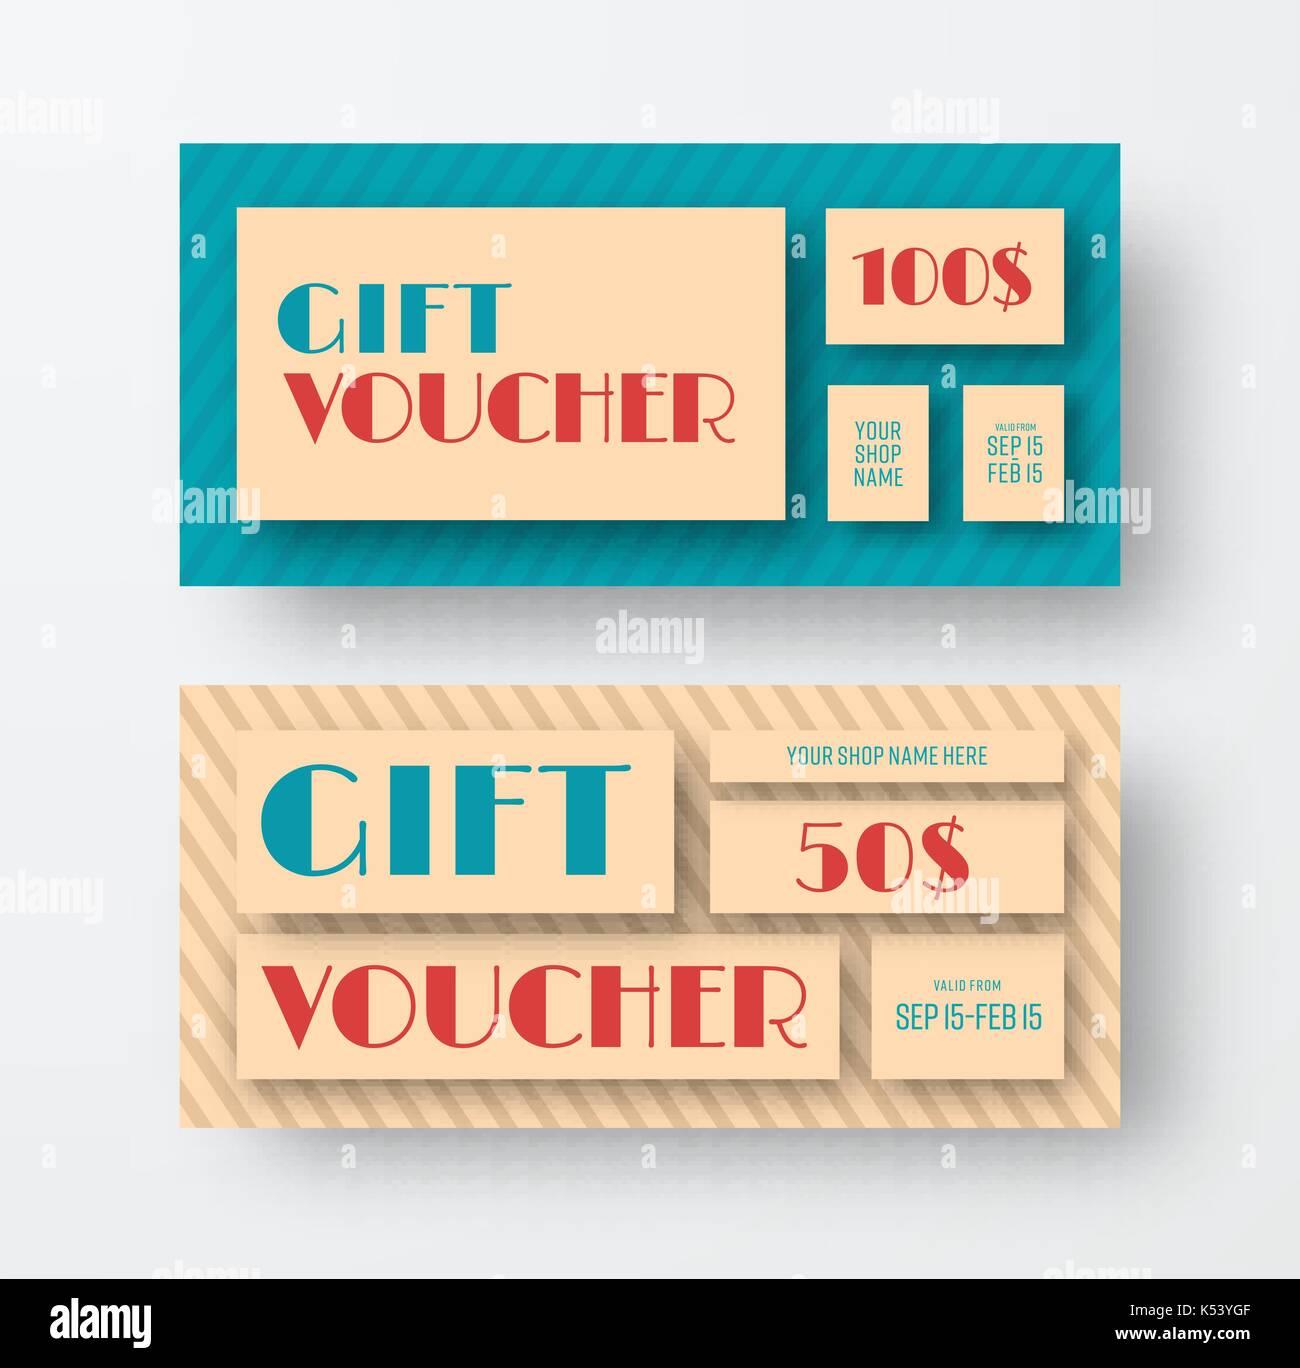 Vintage Gift Voucher Template Imágenes De Stock & Vintage Gift ...